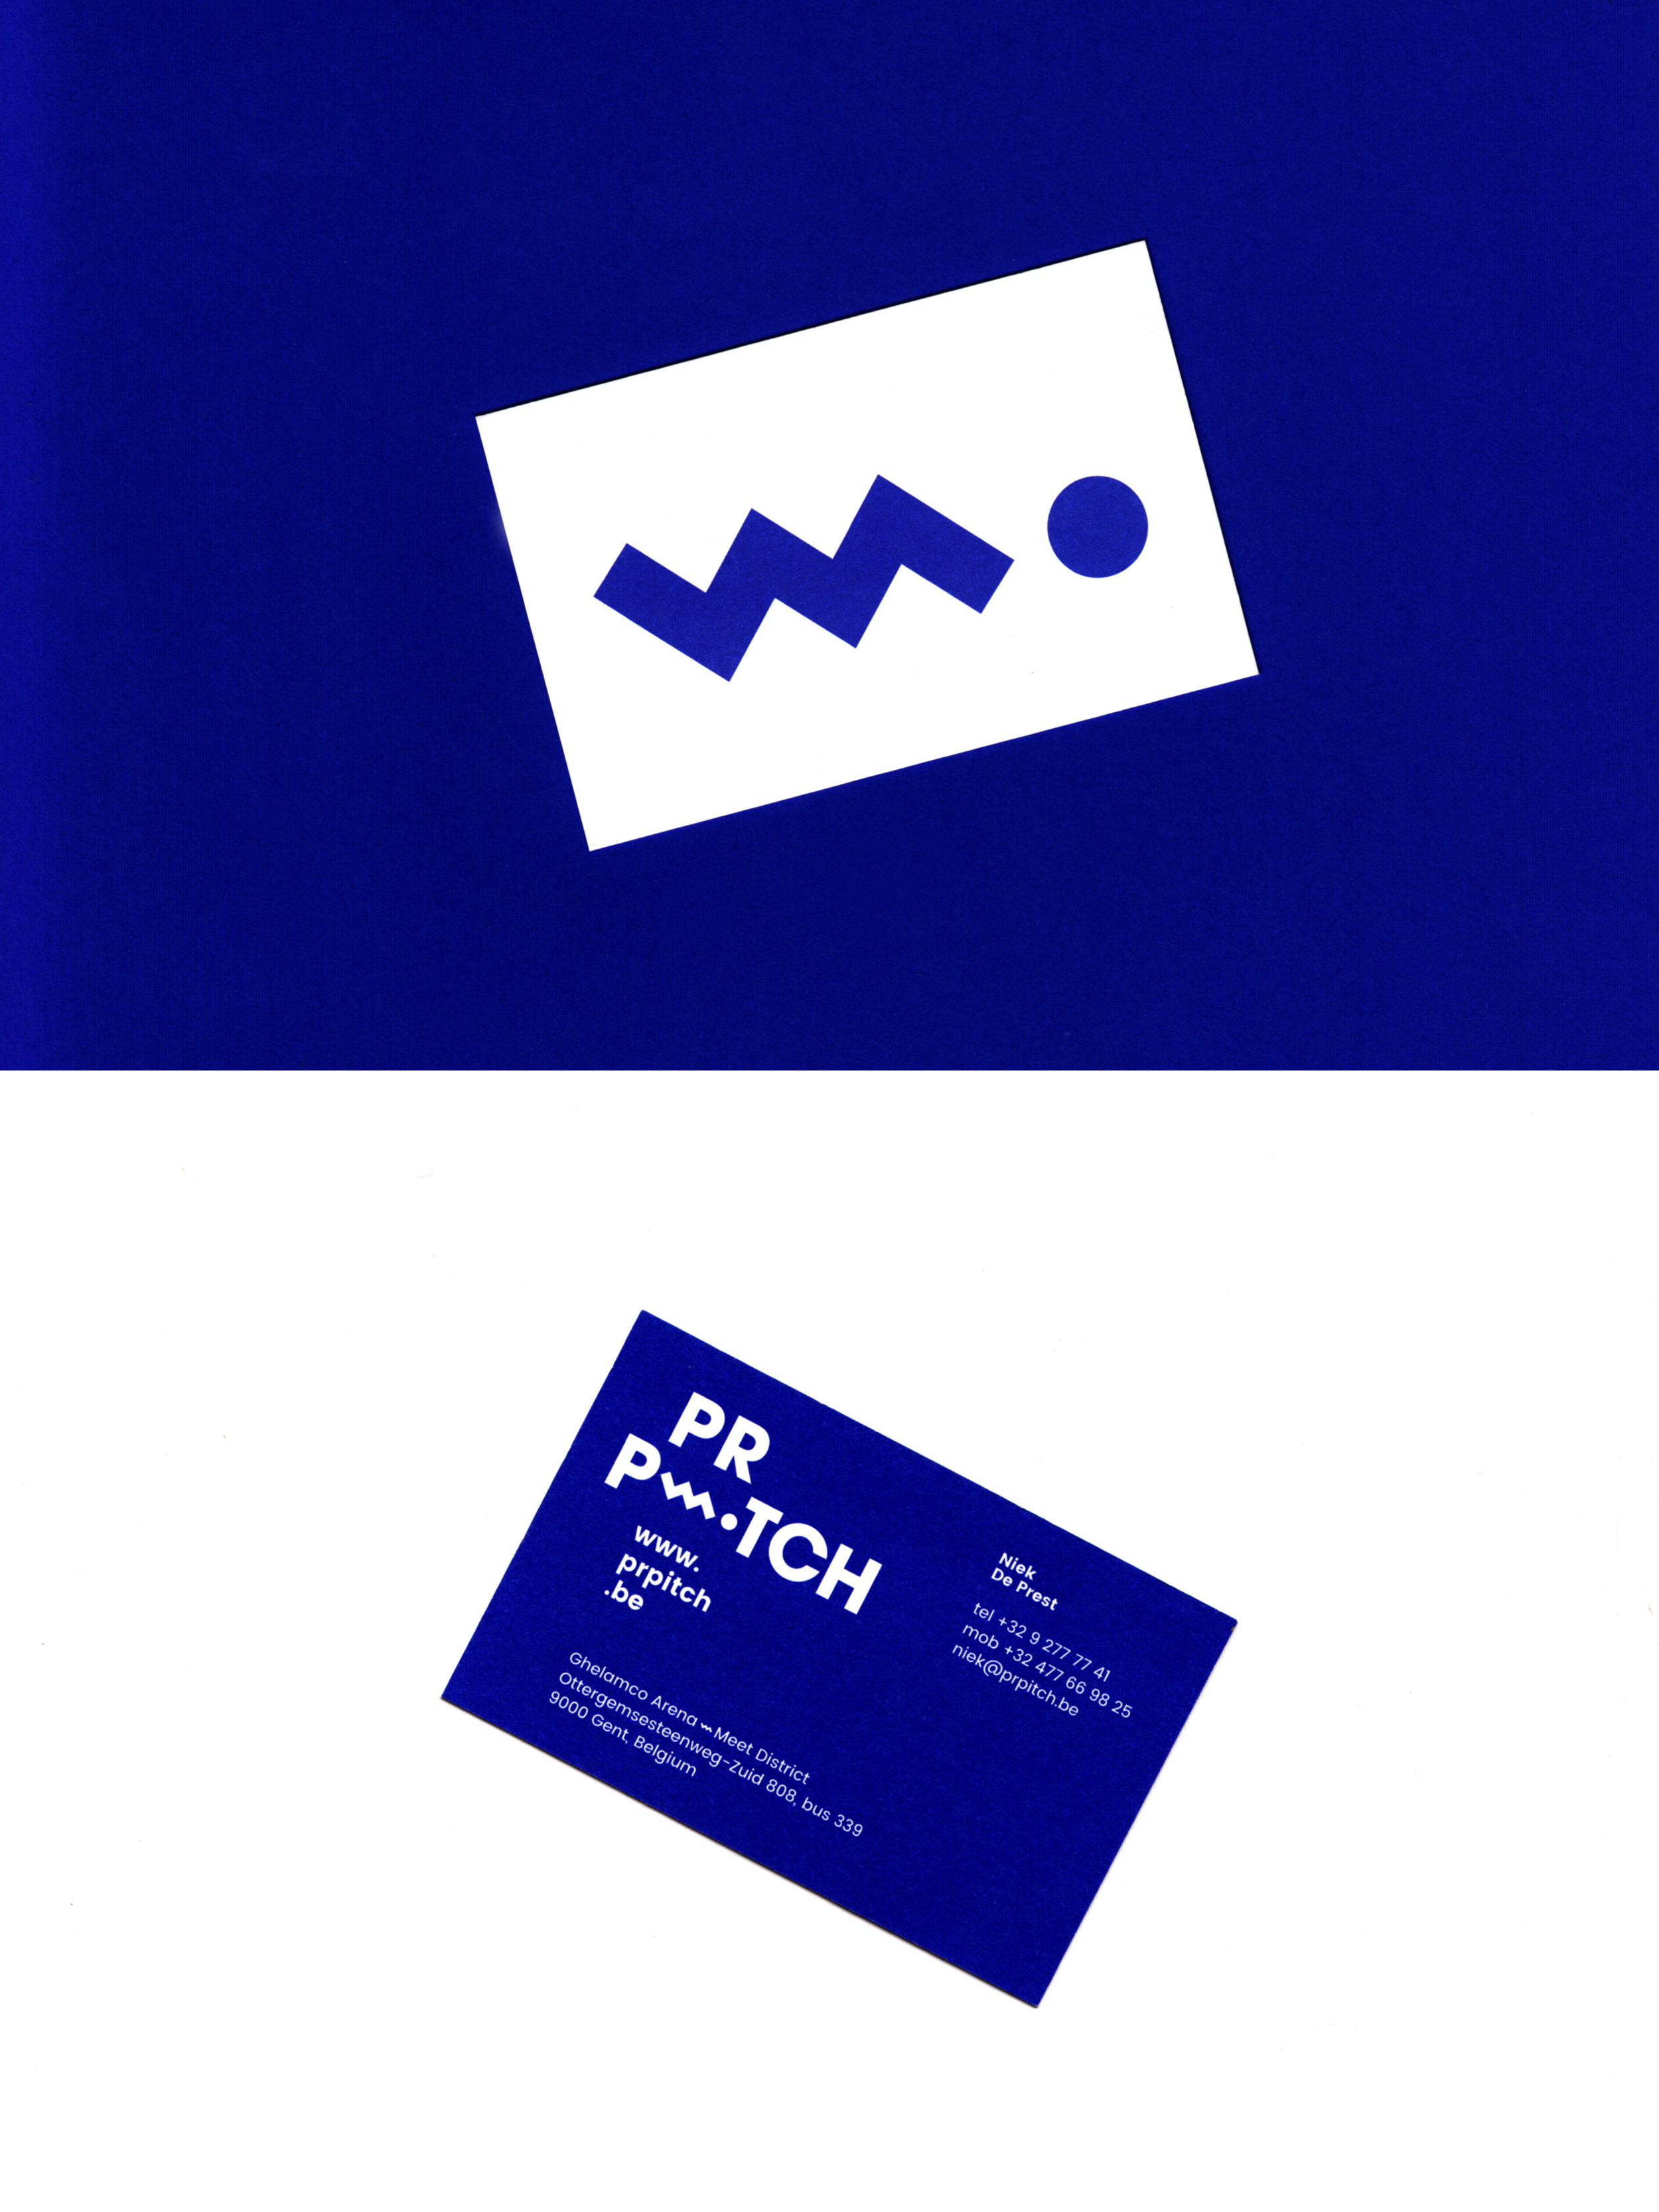 PR-PITCH_business-cards.jpg